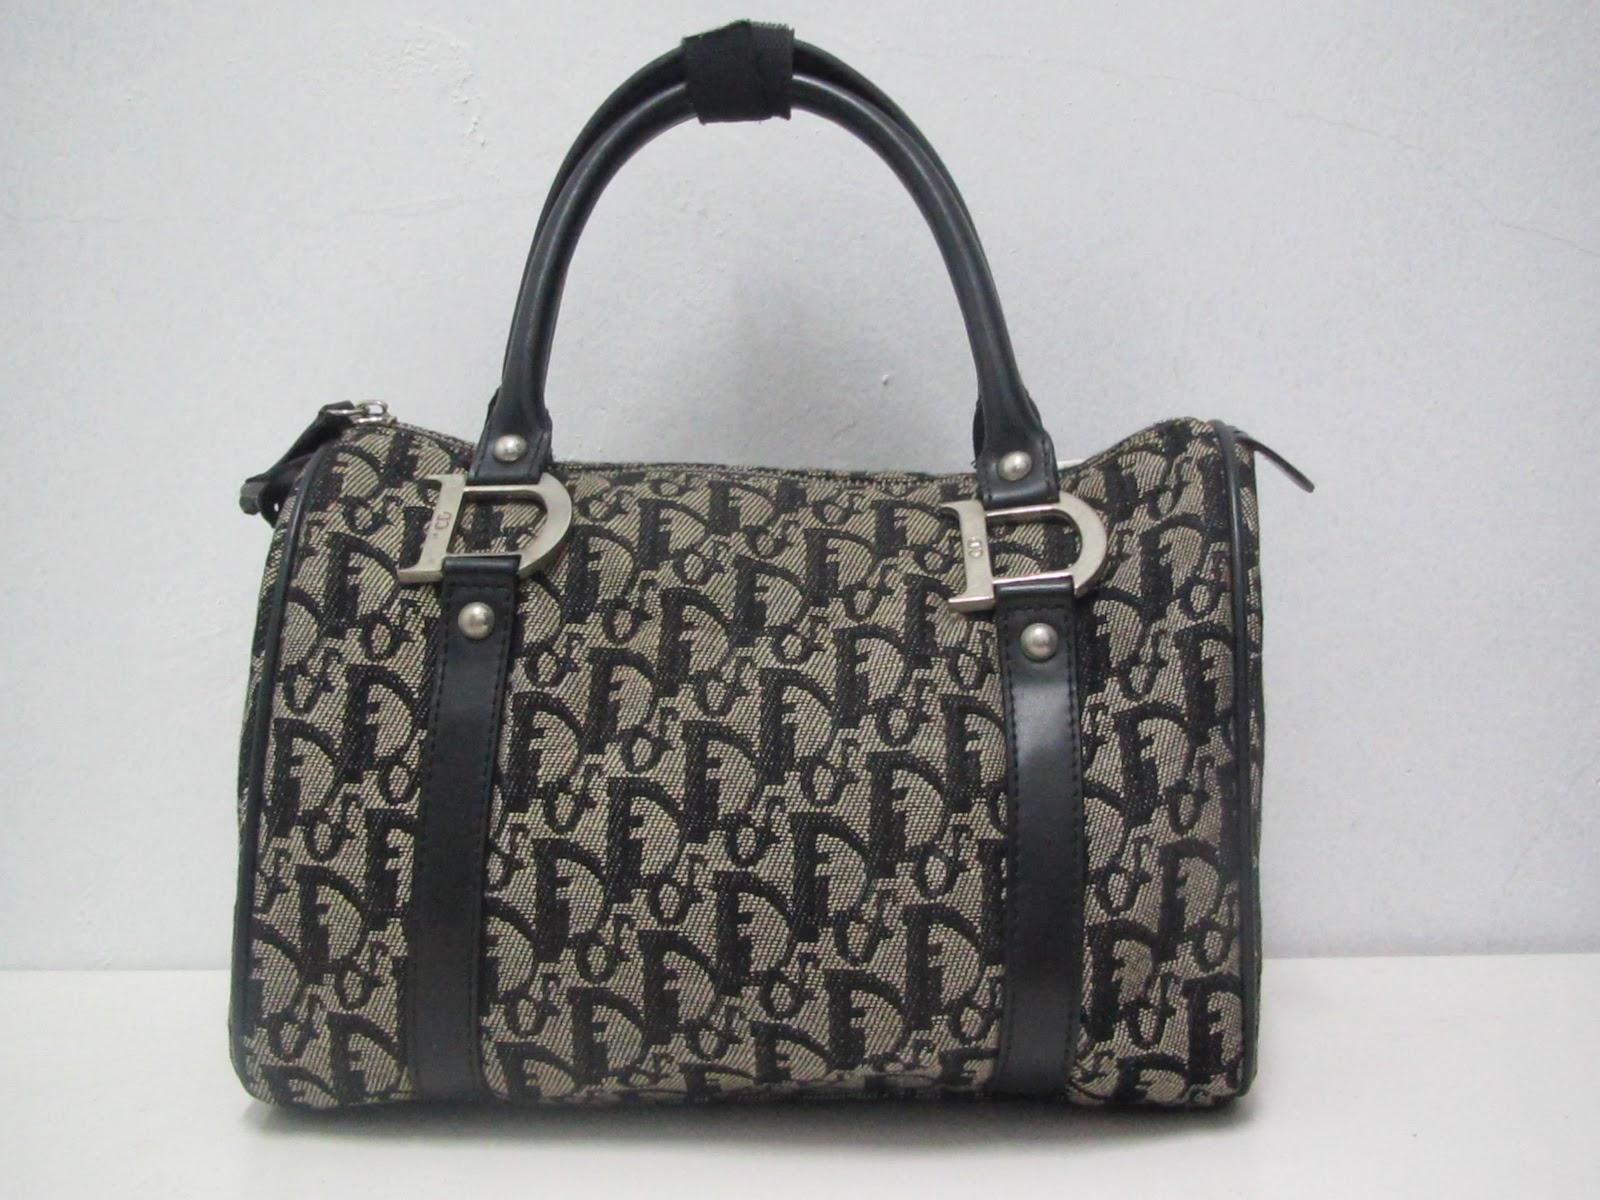 Vintage christian dior handbags